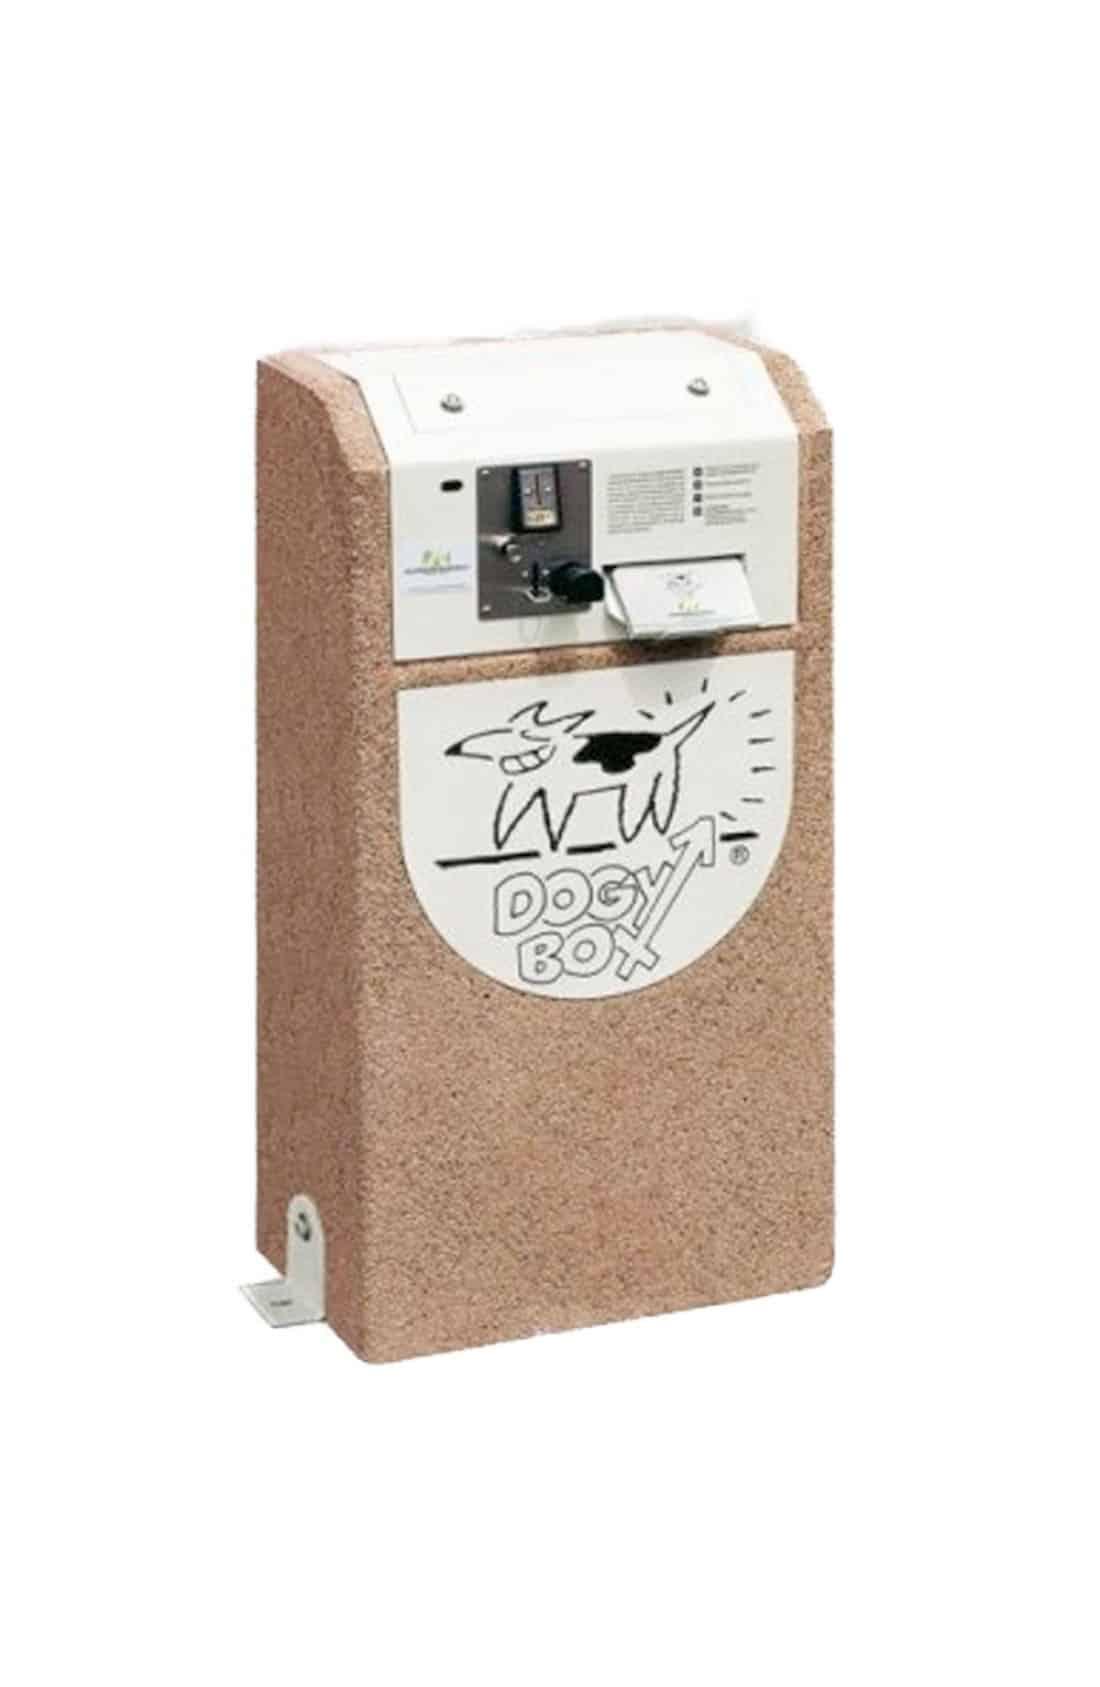 Dogy Box Concrete Dispenser